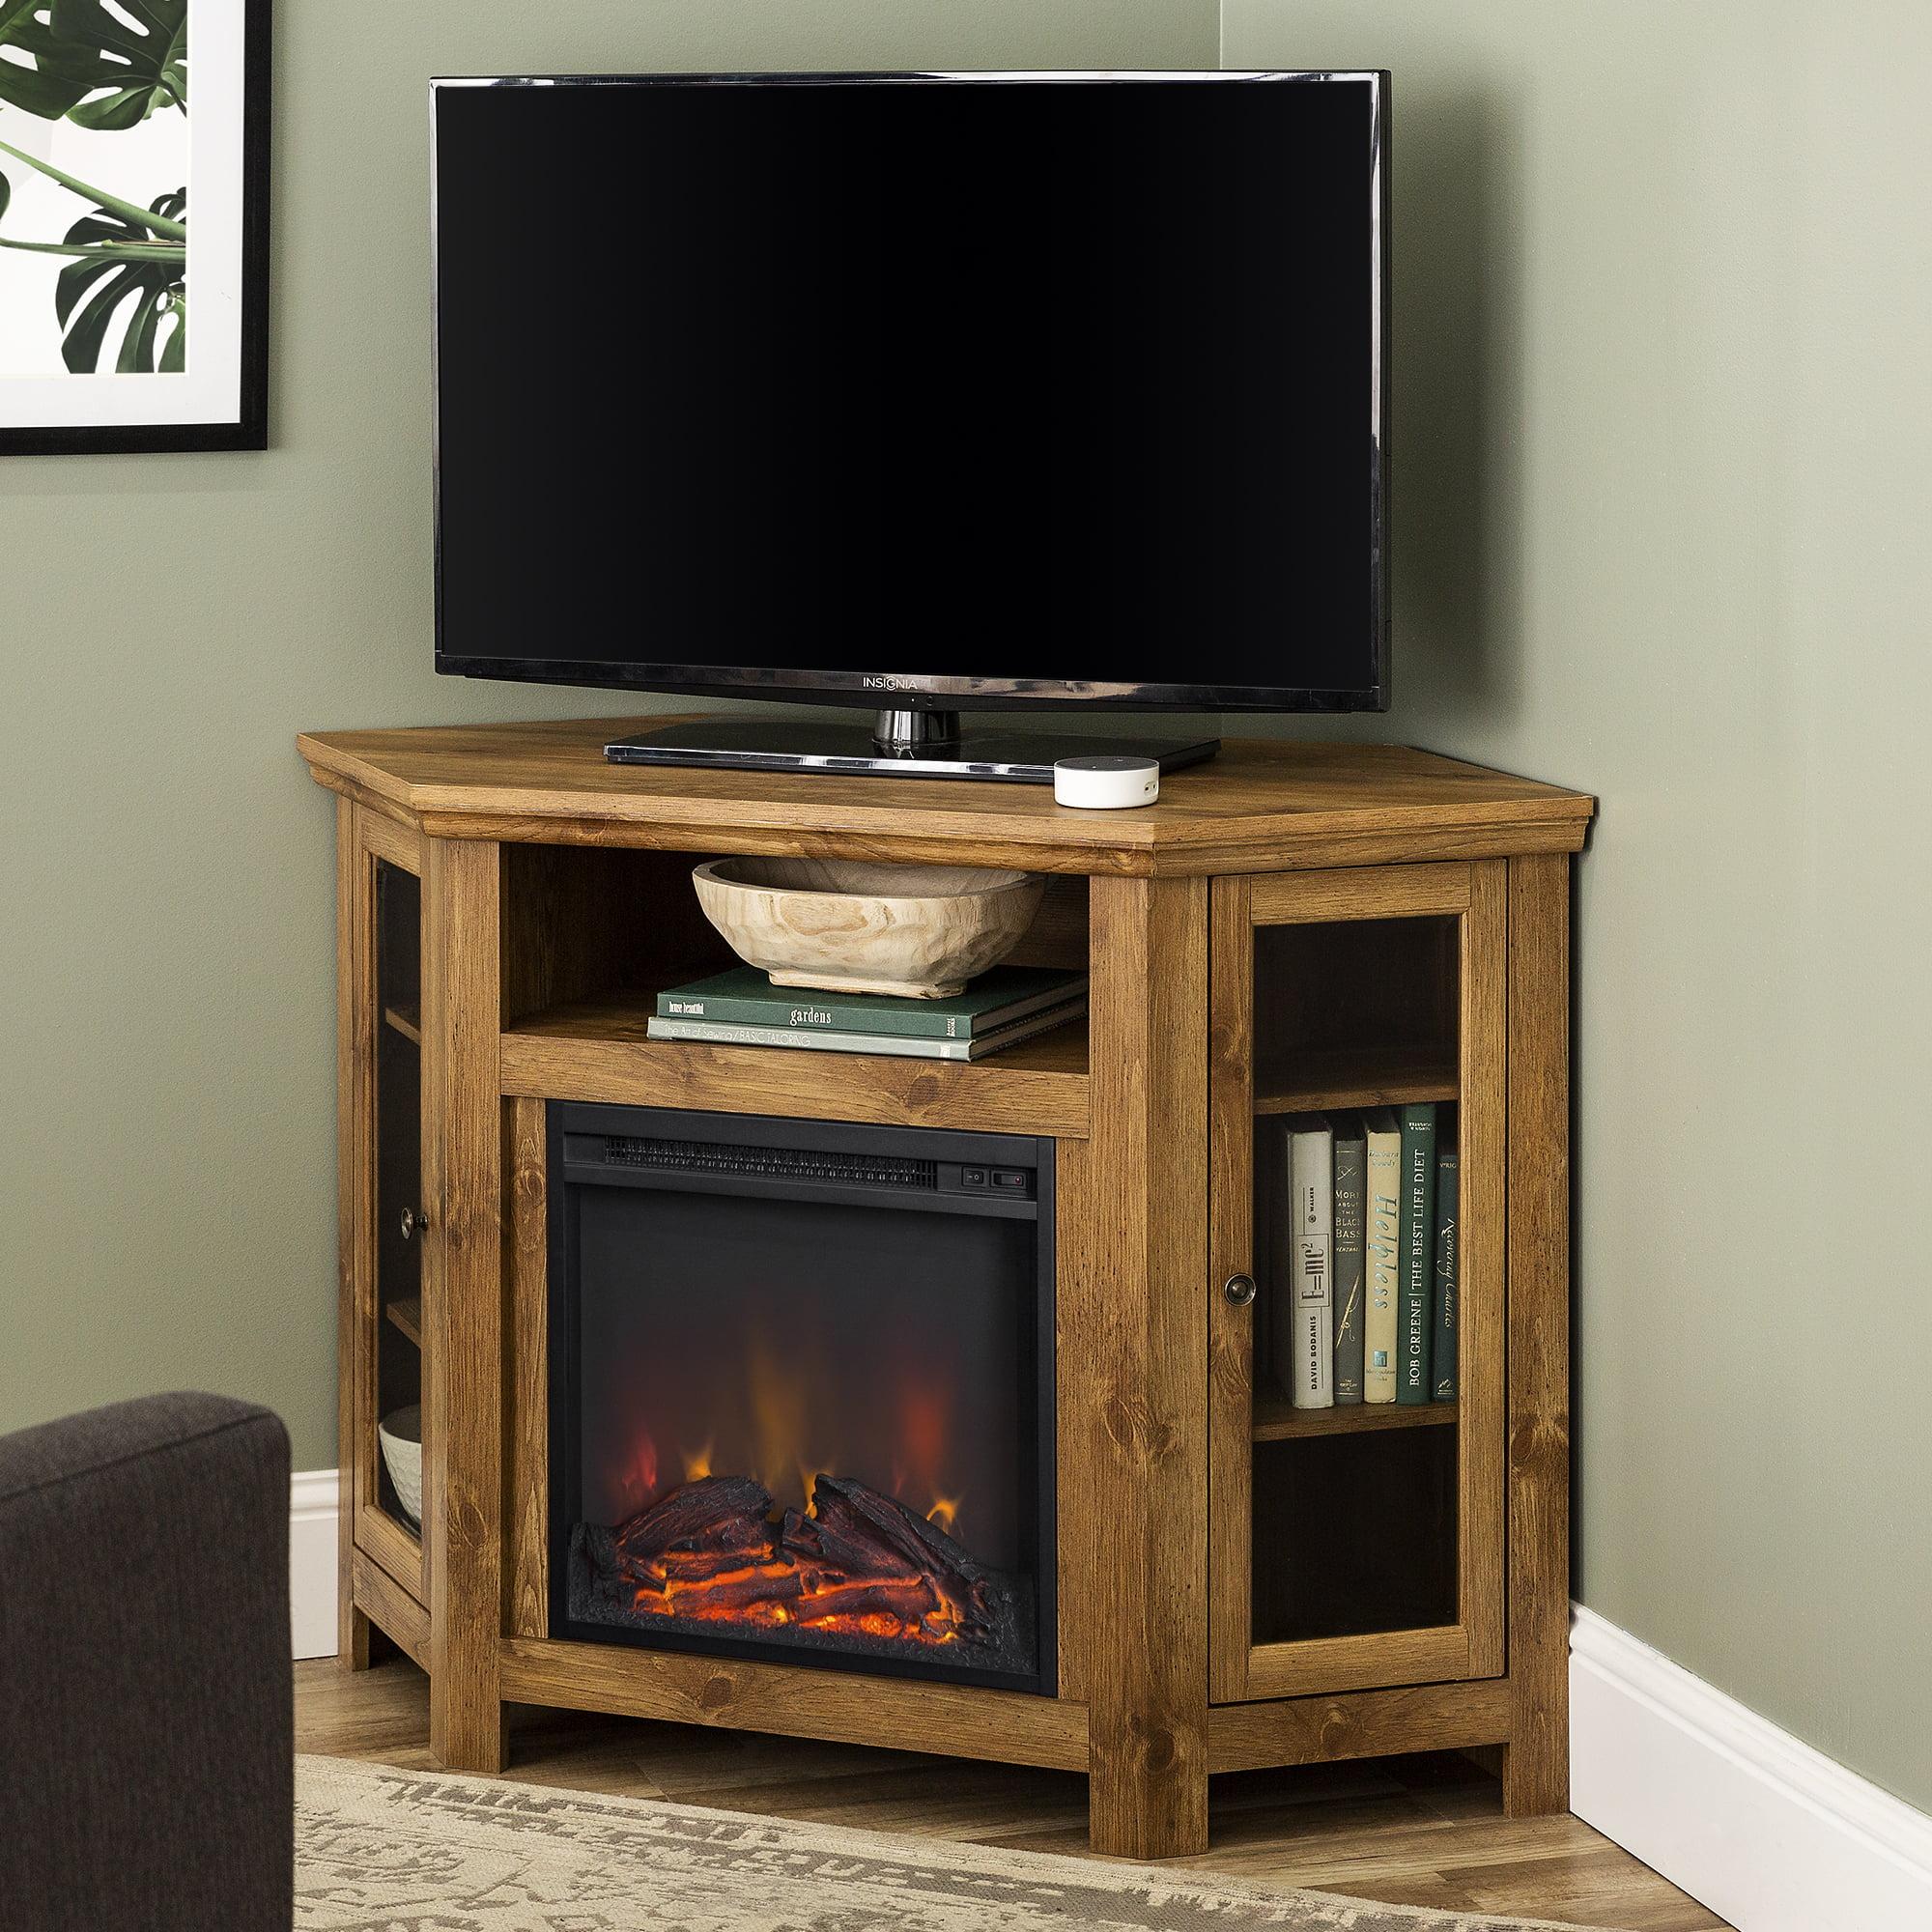 Walker Edison Barnwood Corner Fireplace Tv Stand For Tvs Up To 55 Walmart Com Walmart Com